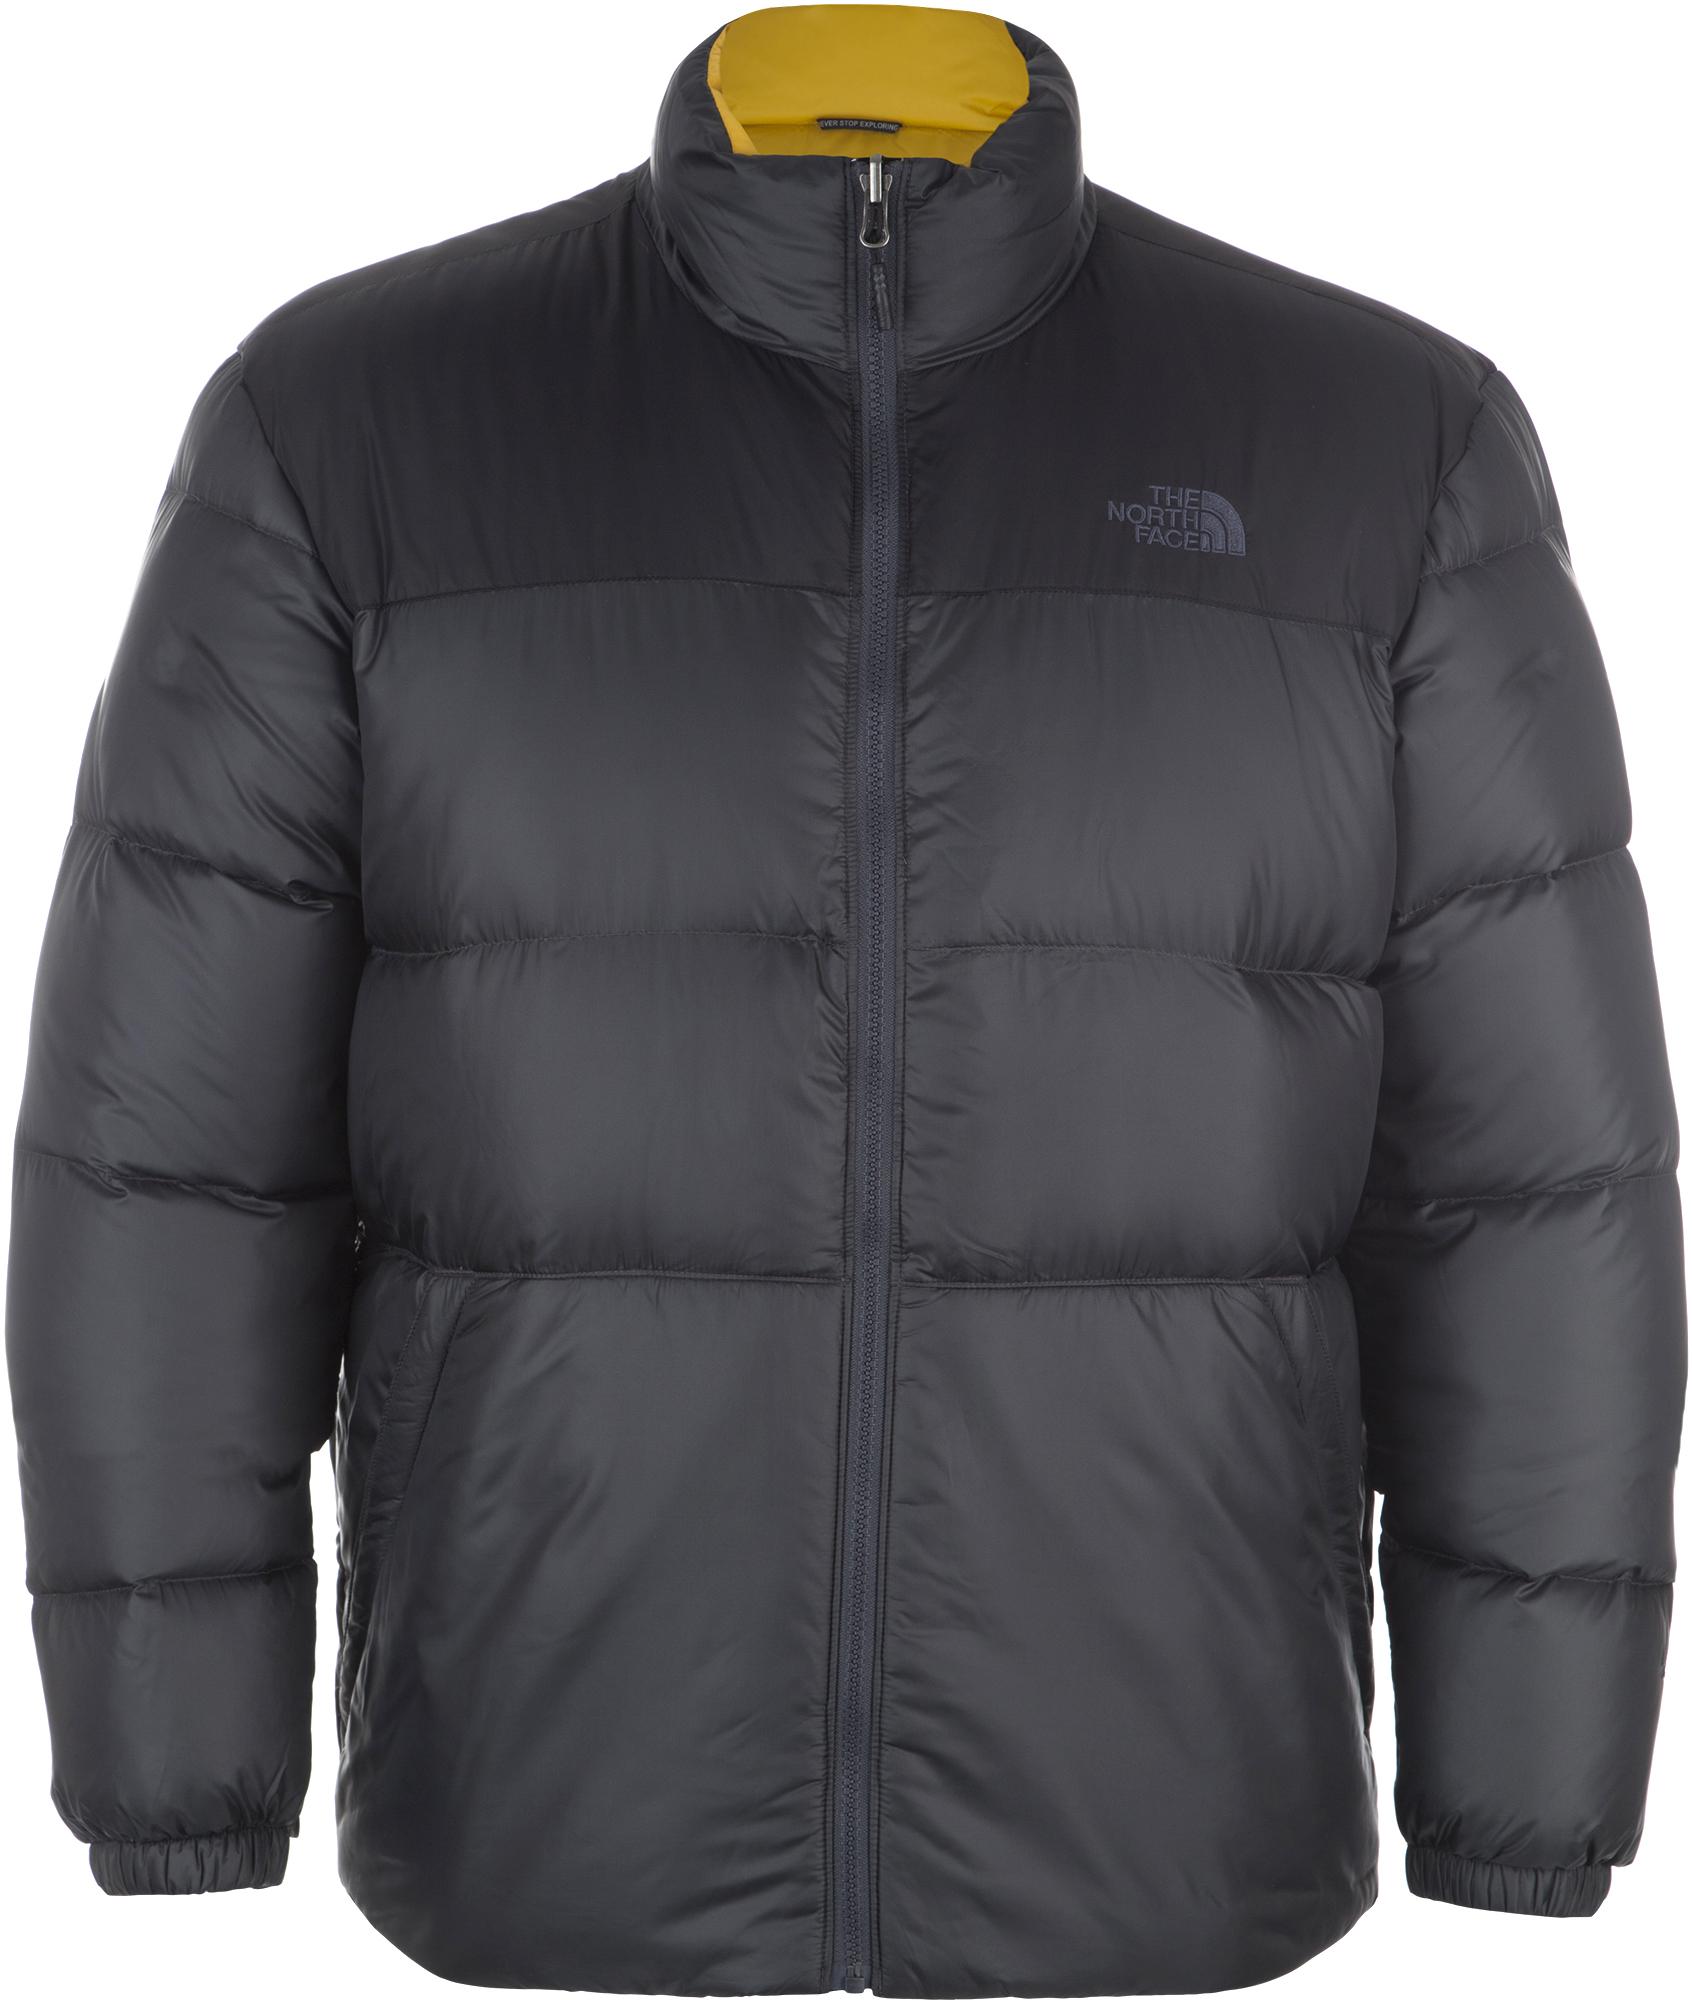 The North Face Куртка пуховая мужская The North Face Nuptse III, размер 50 цена